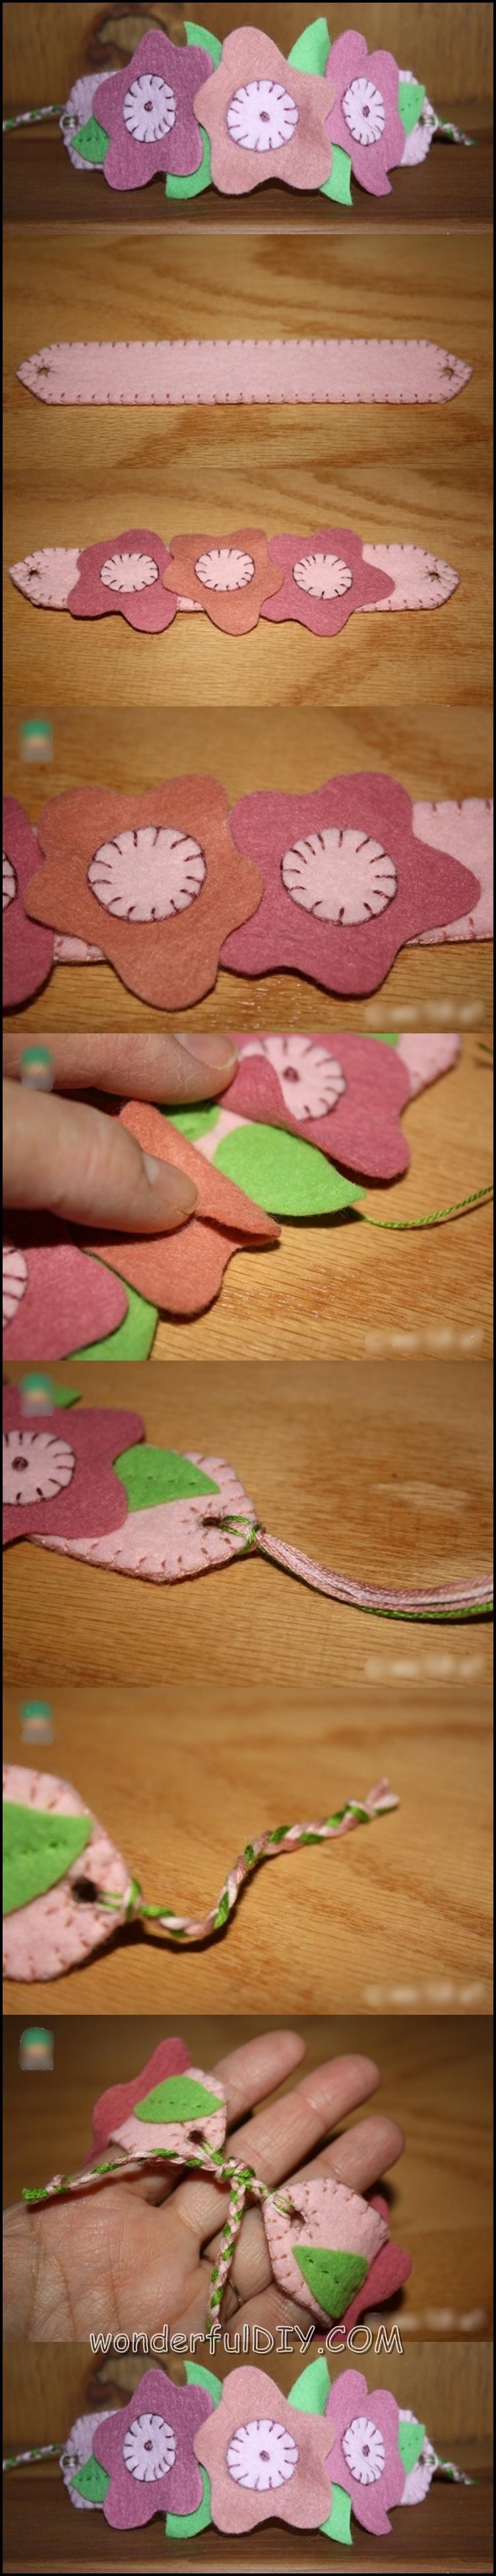 flower bracelet m.w Wonderful DIY flower bracelet